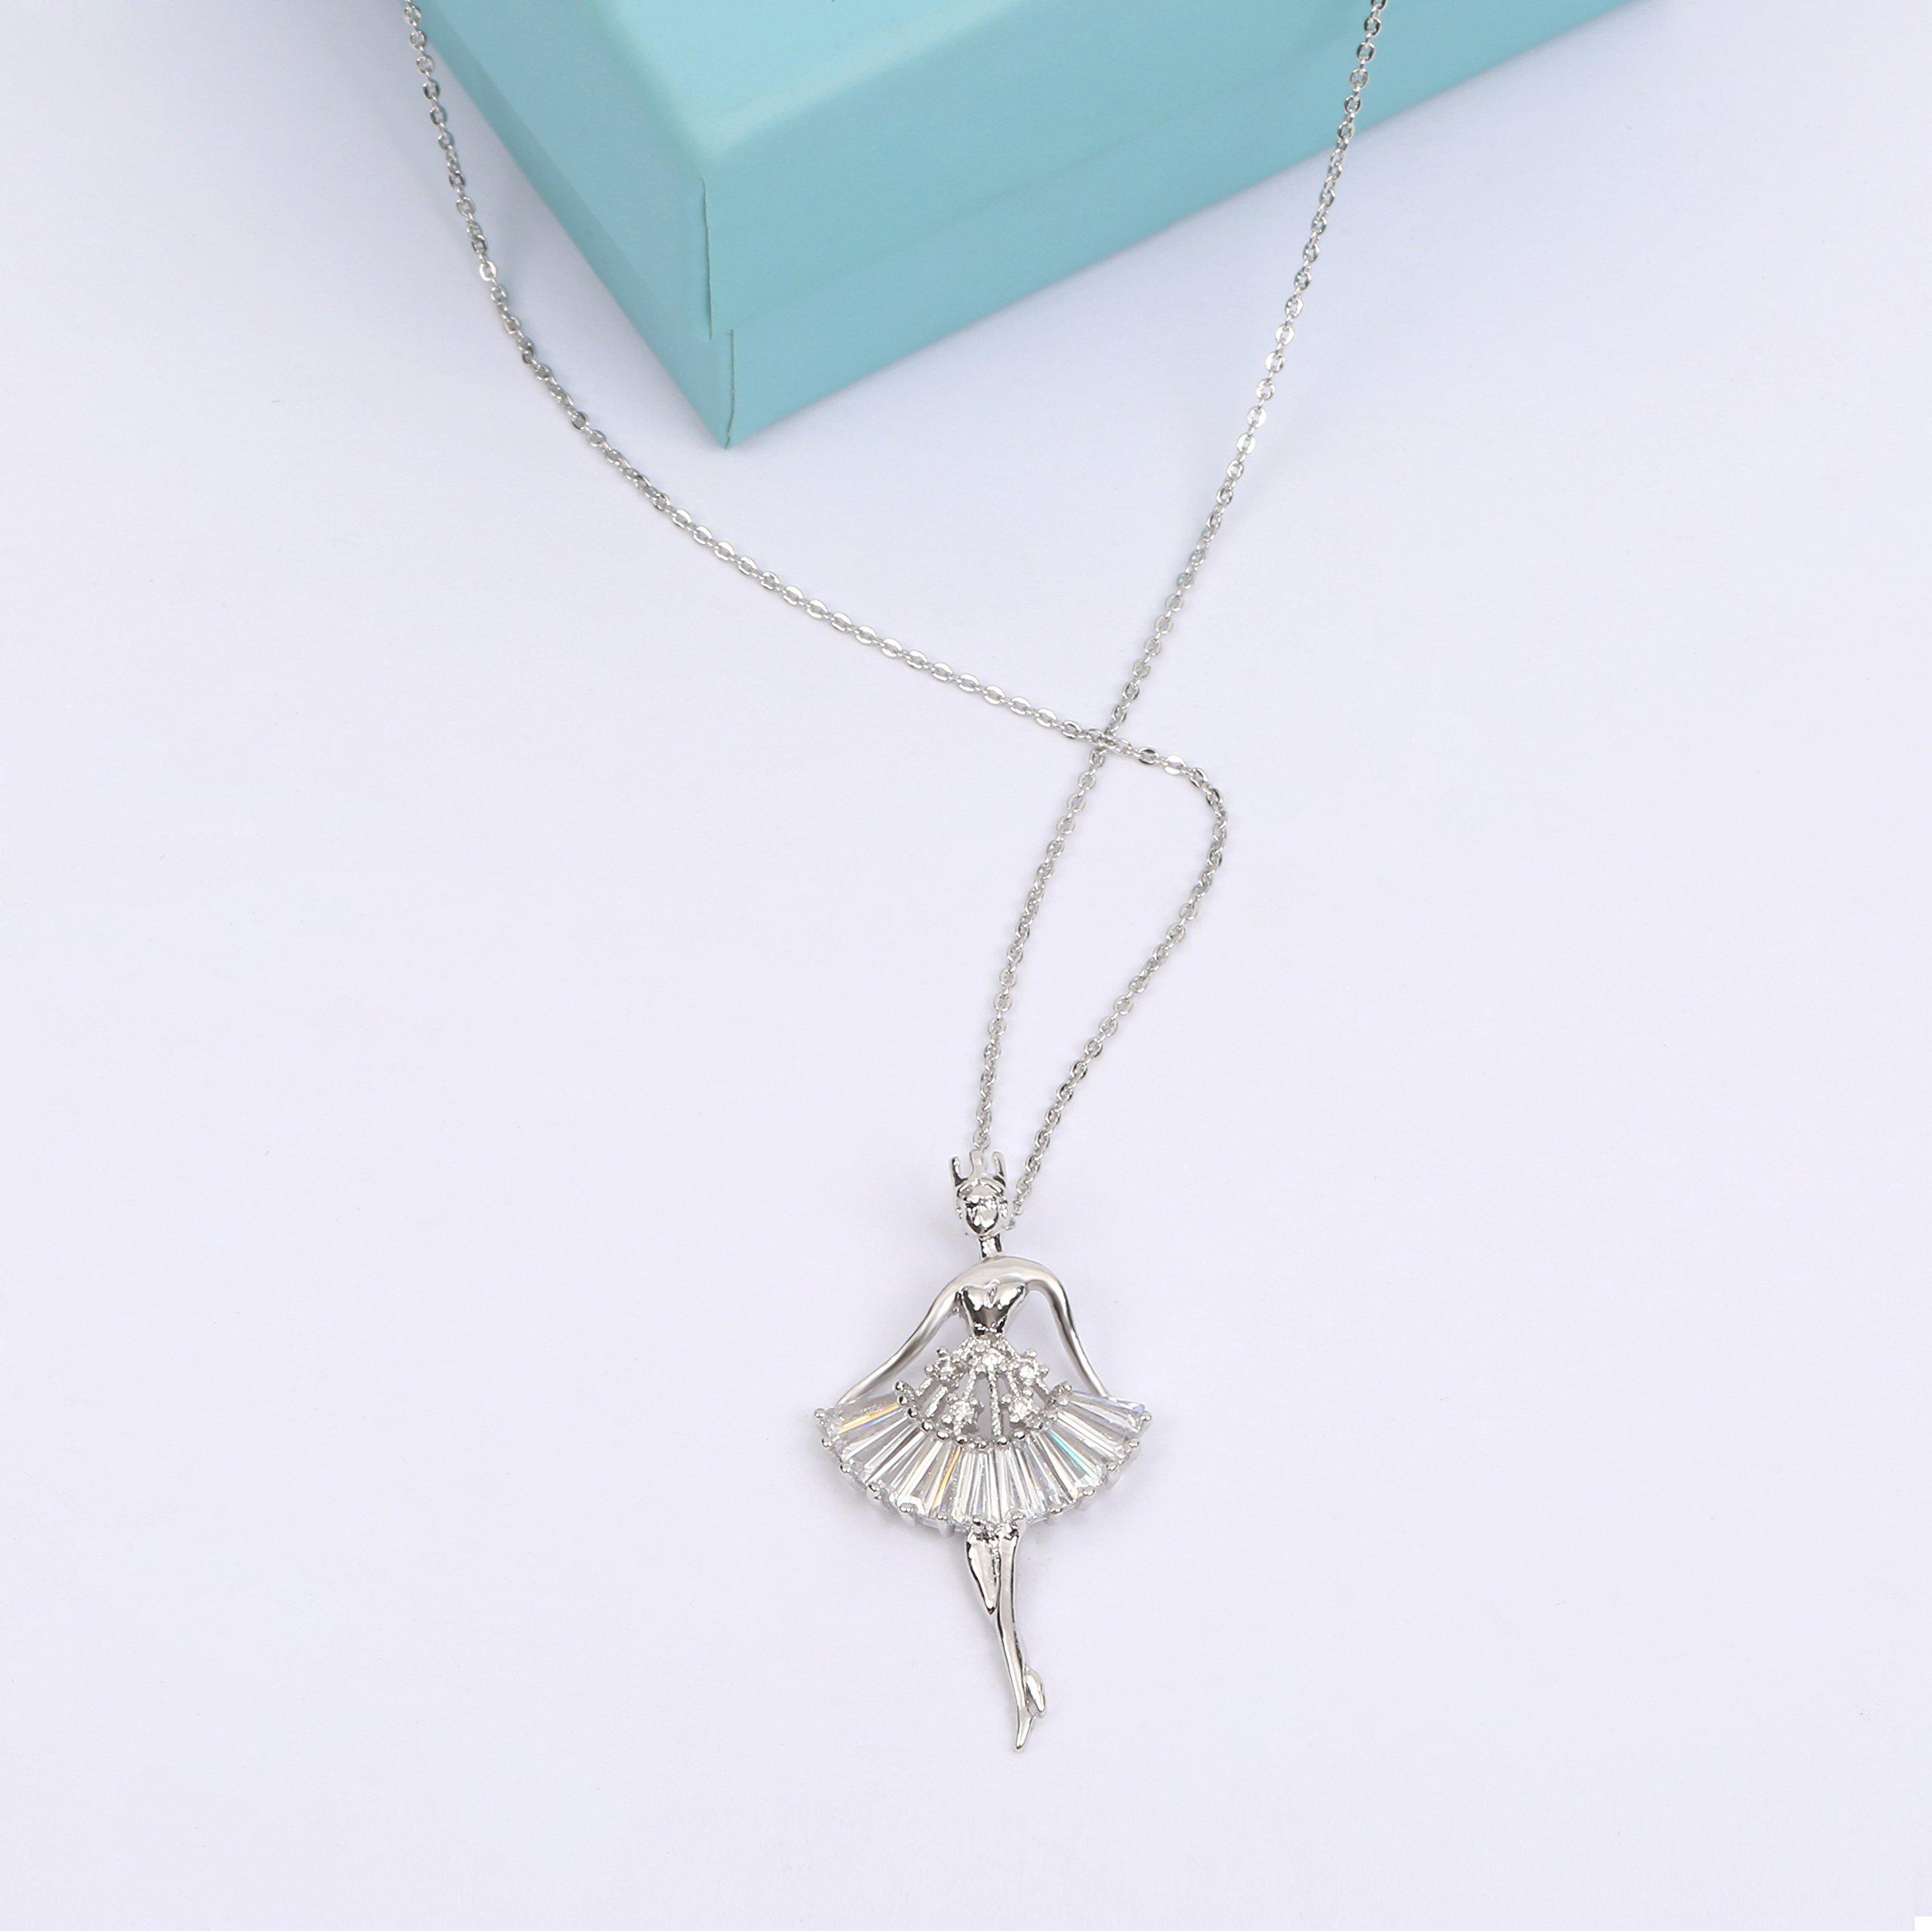 MYKEA Elegant Jewelry Set for Women 18K White Gold Ballerina Girl Pendant Necklace with Cubic Zirconia Stud Earrings for Teen Girls Jewelry by MYKEA (Image #4)